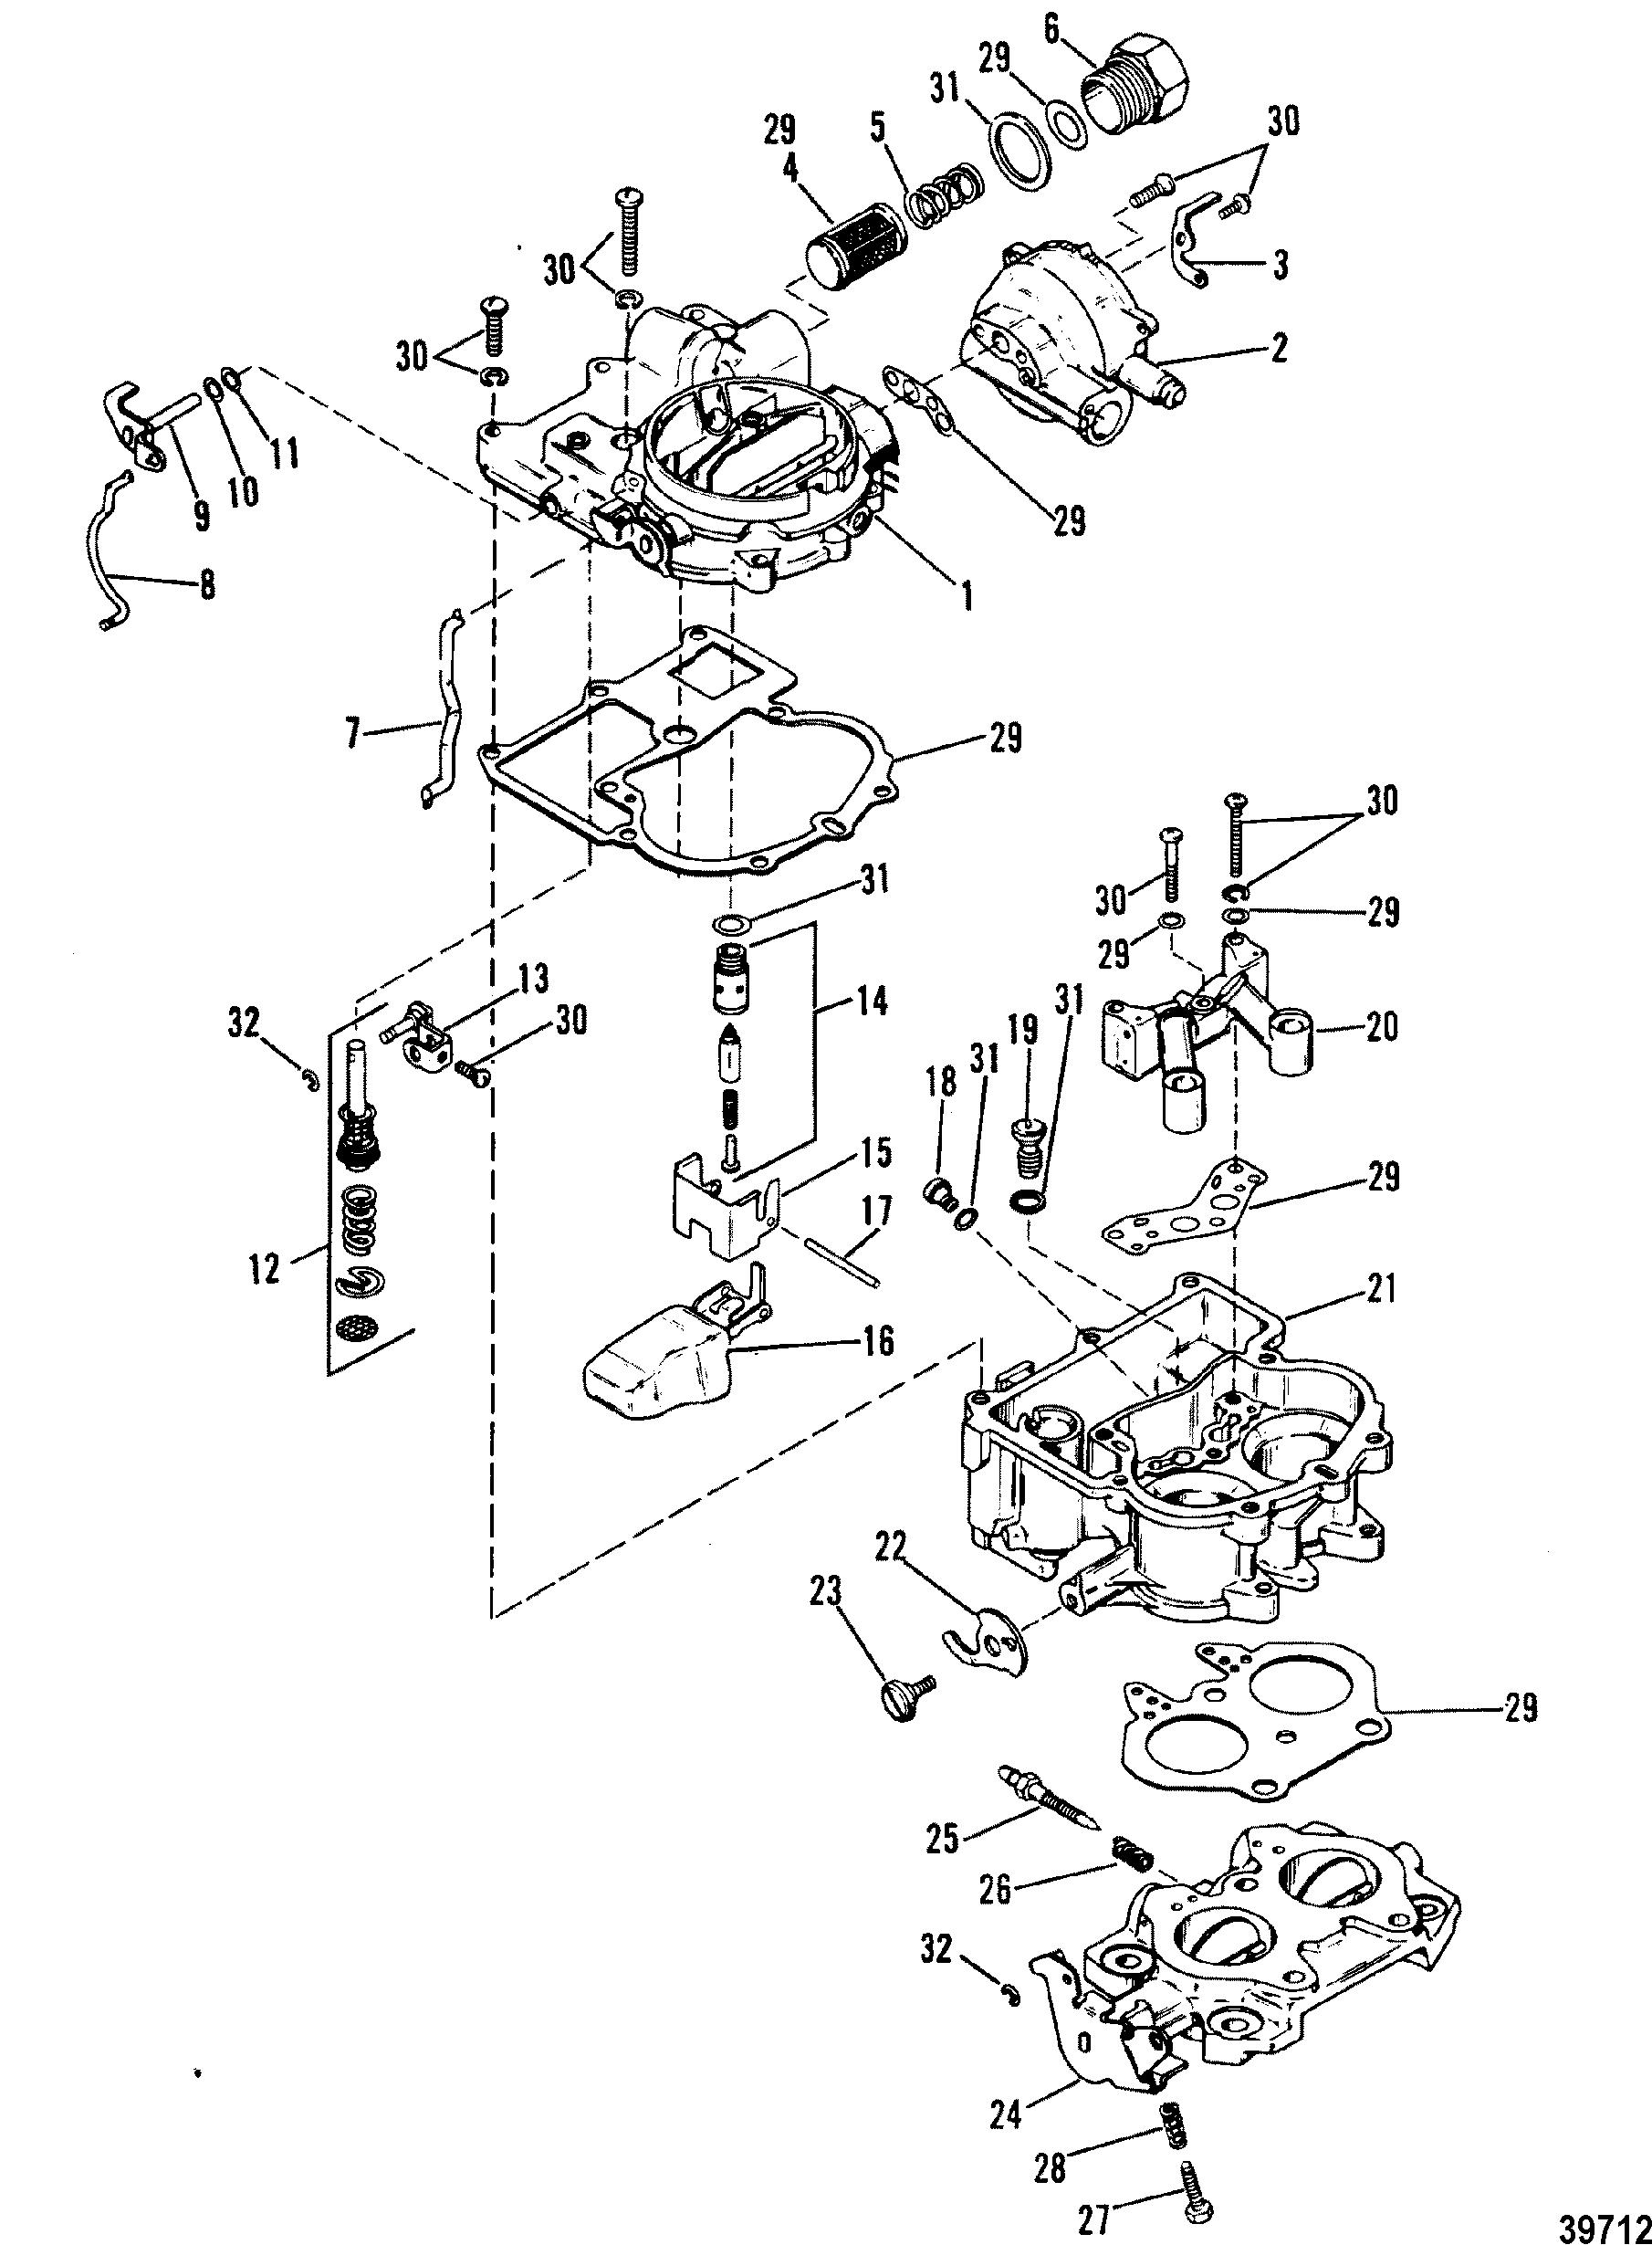 carburetor mercarb 2 barrel for mercruiser 4 3l 4 3lx alpha one engine 262 cid